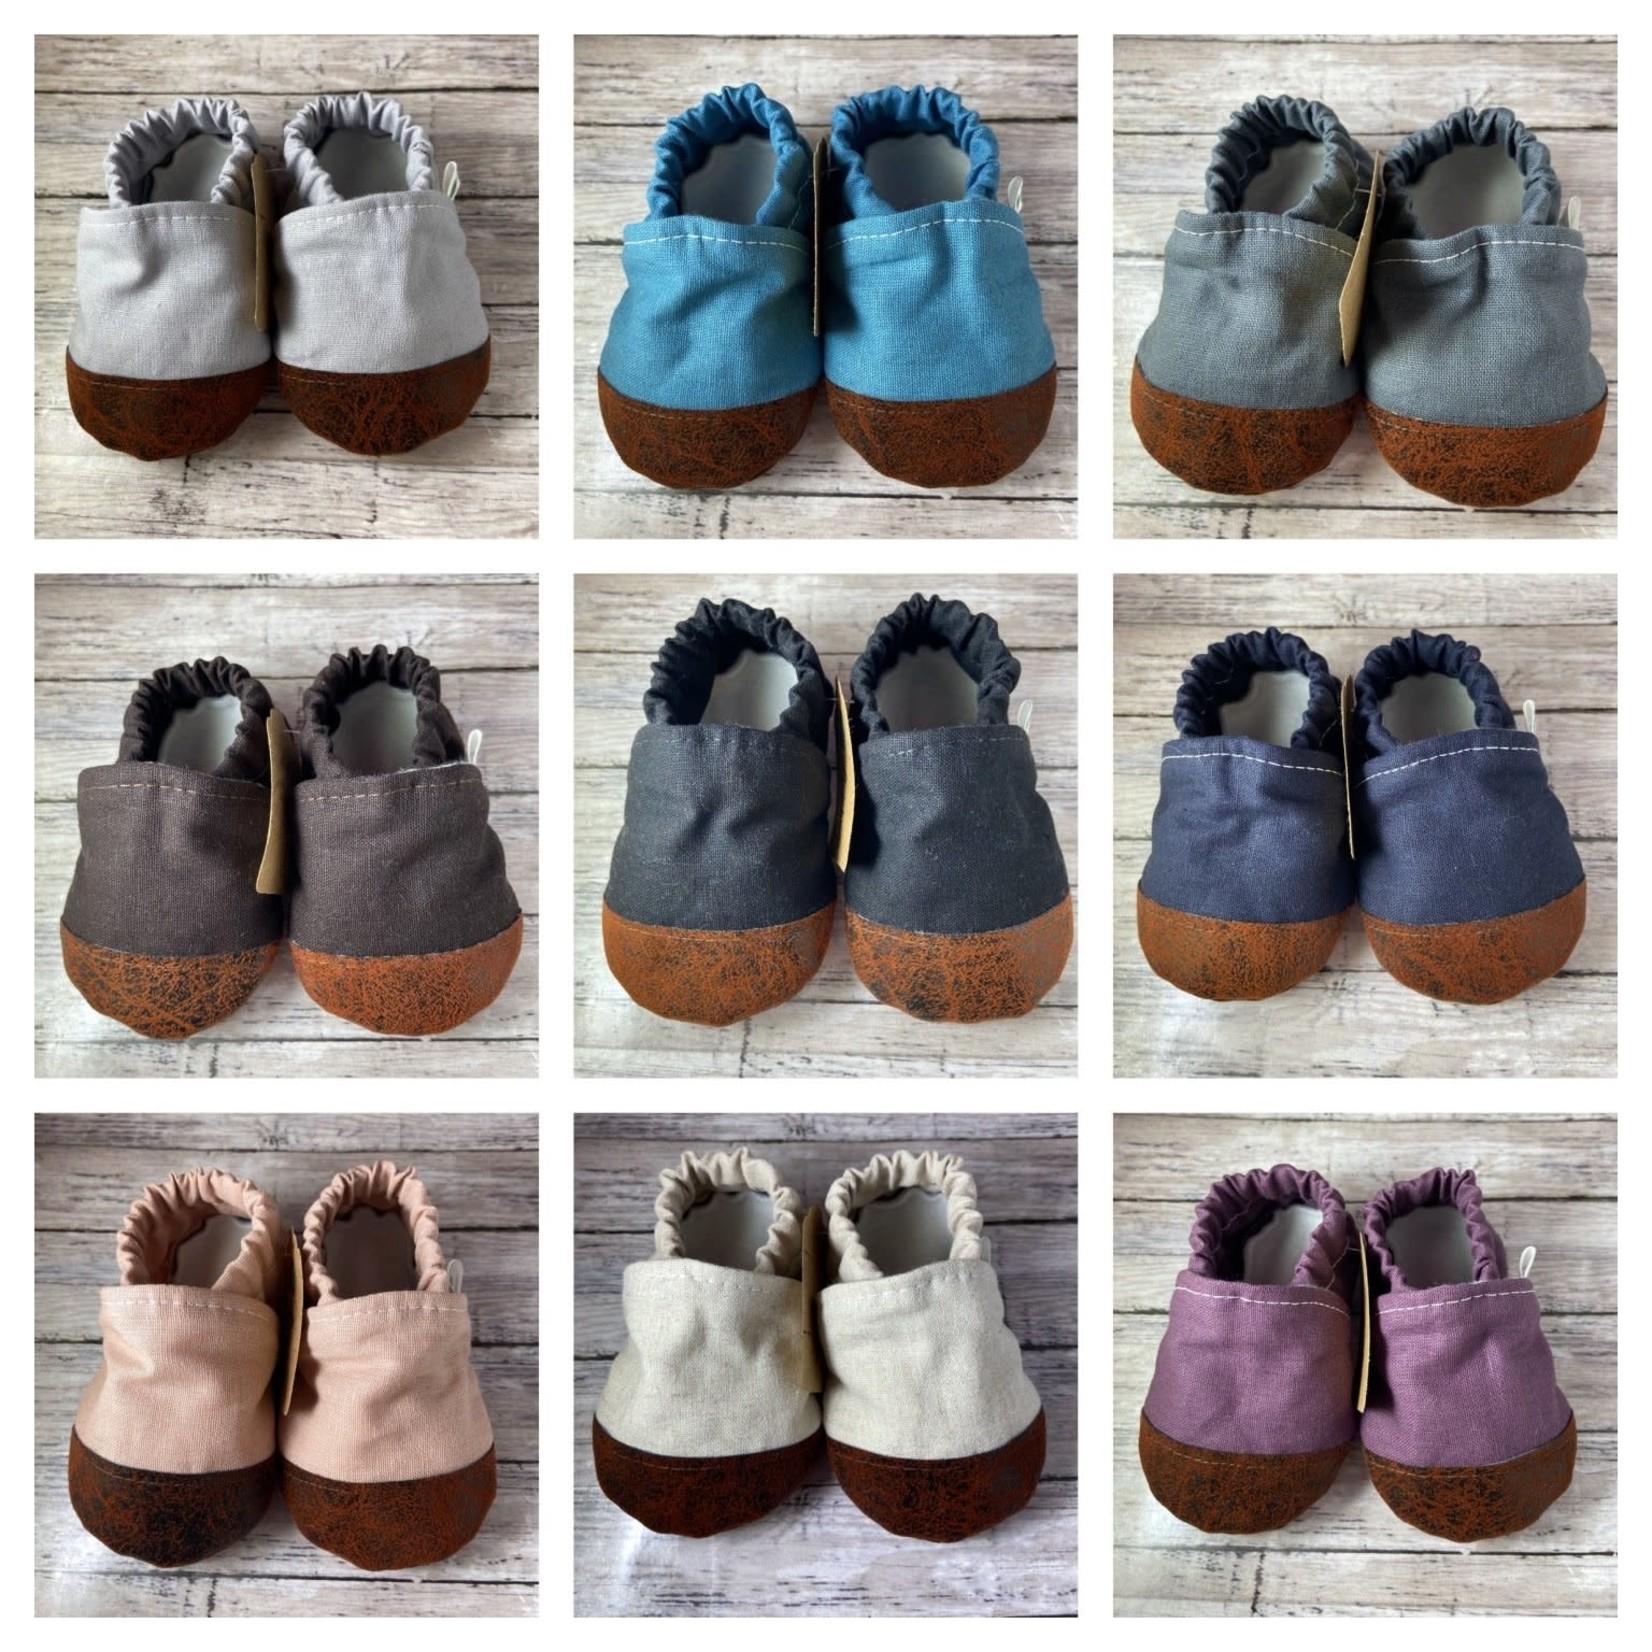 Lexiebugs 12-18m Baby Shoe with Toe